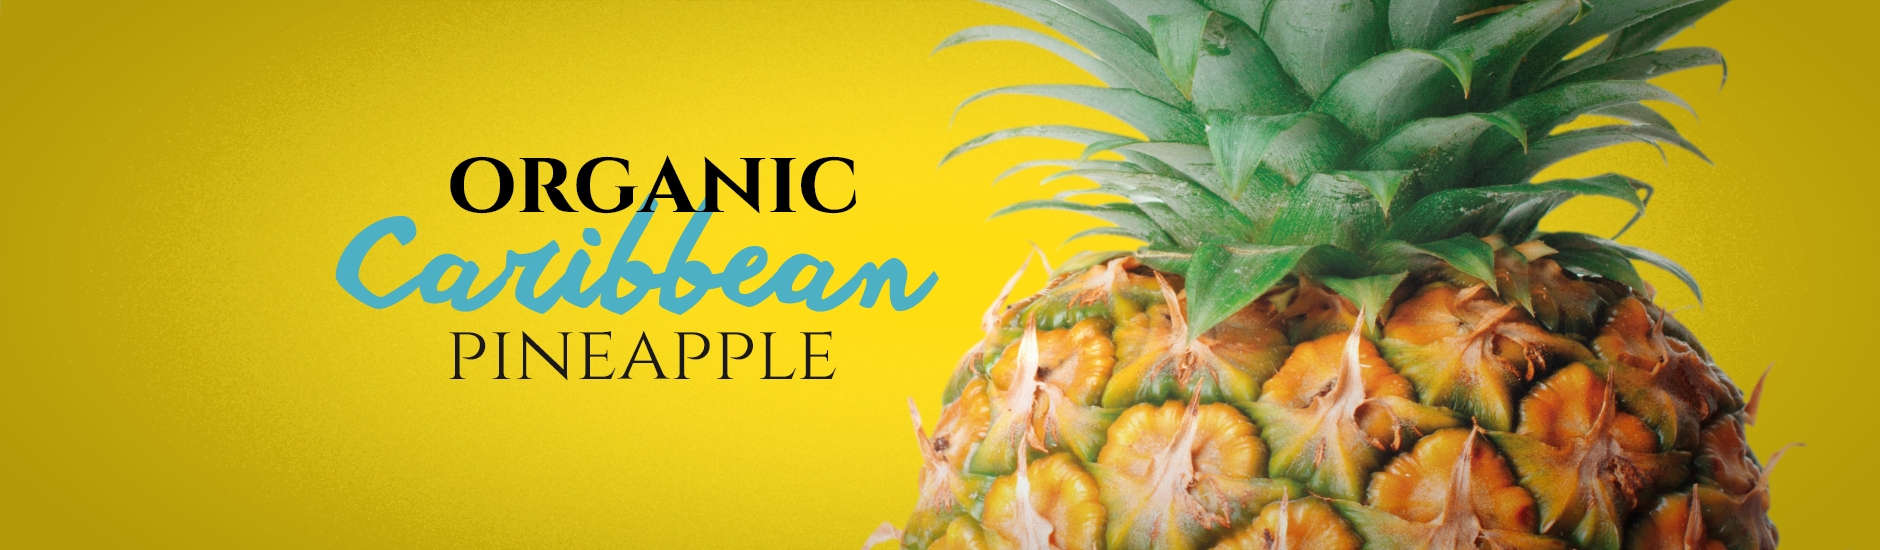 organic caribbean pineapple